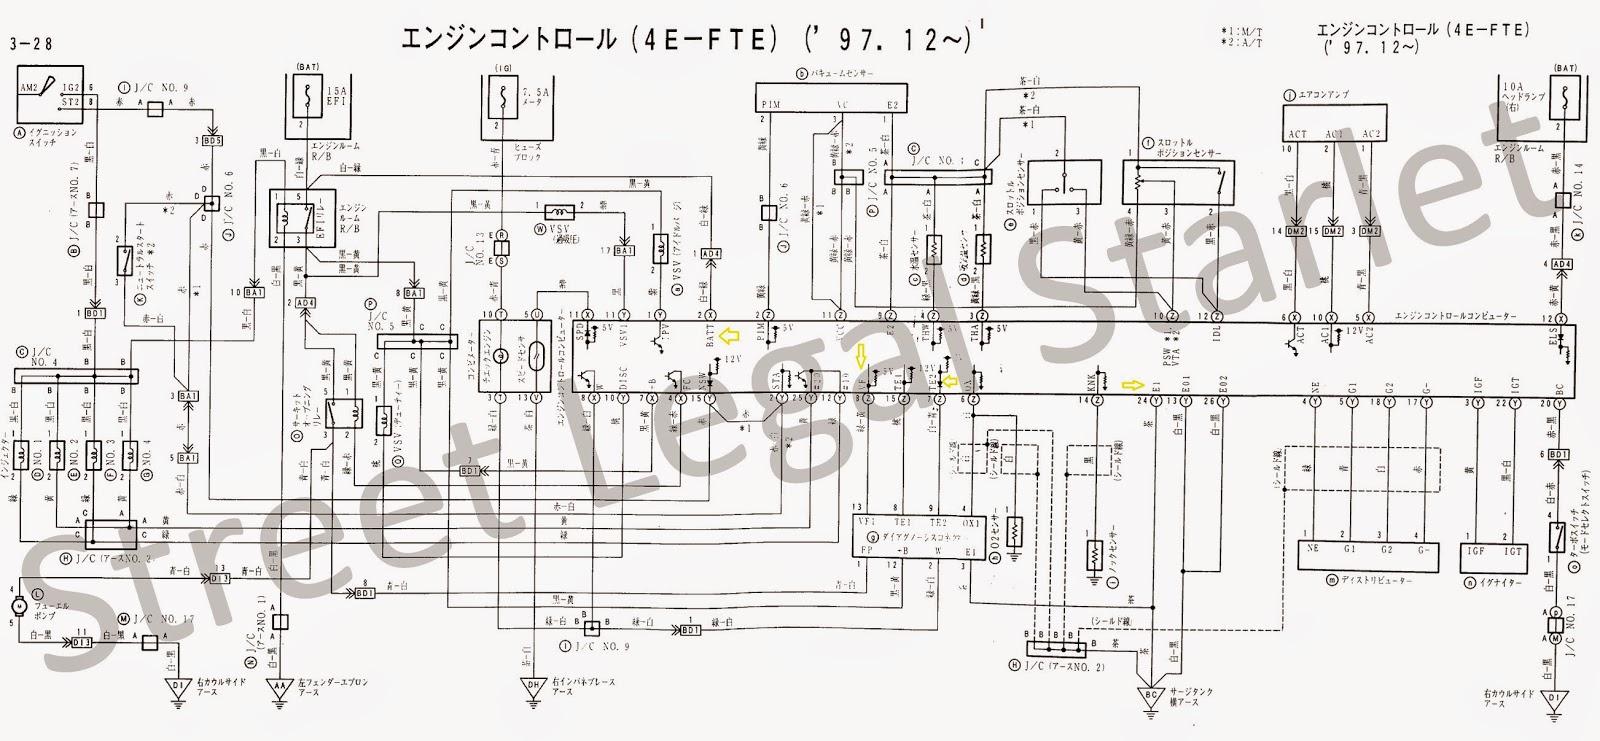 toyota starlet 4efe wiring diagram